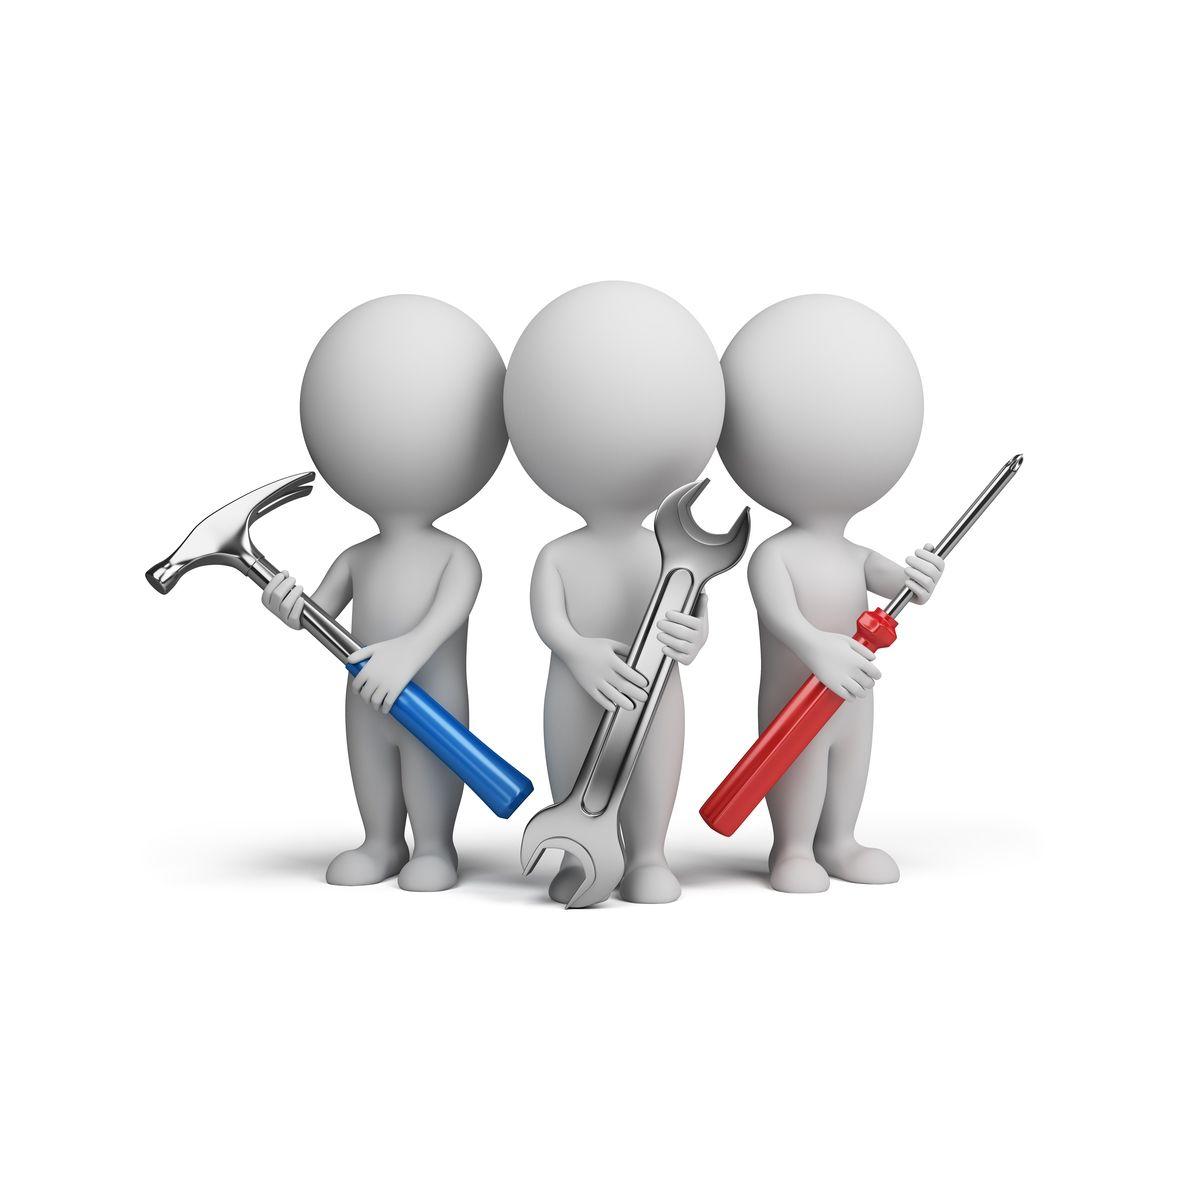 Instalace a technická podpora pro pokladny na EET GASTROMEX s.r.o.